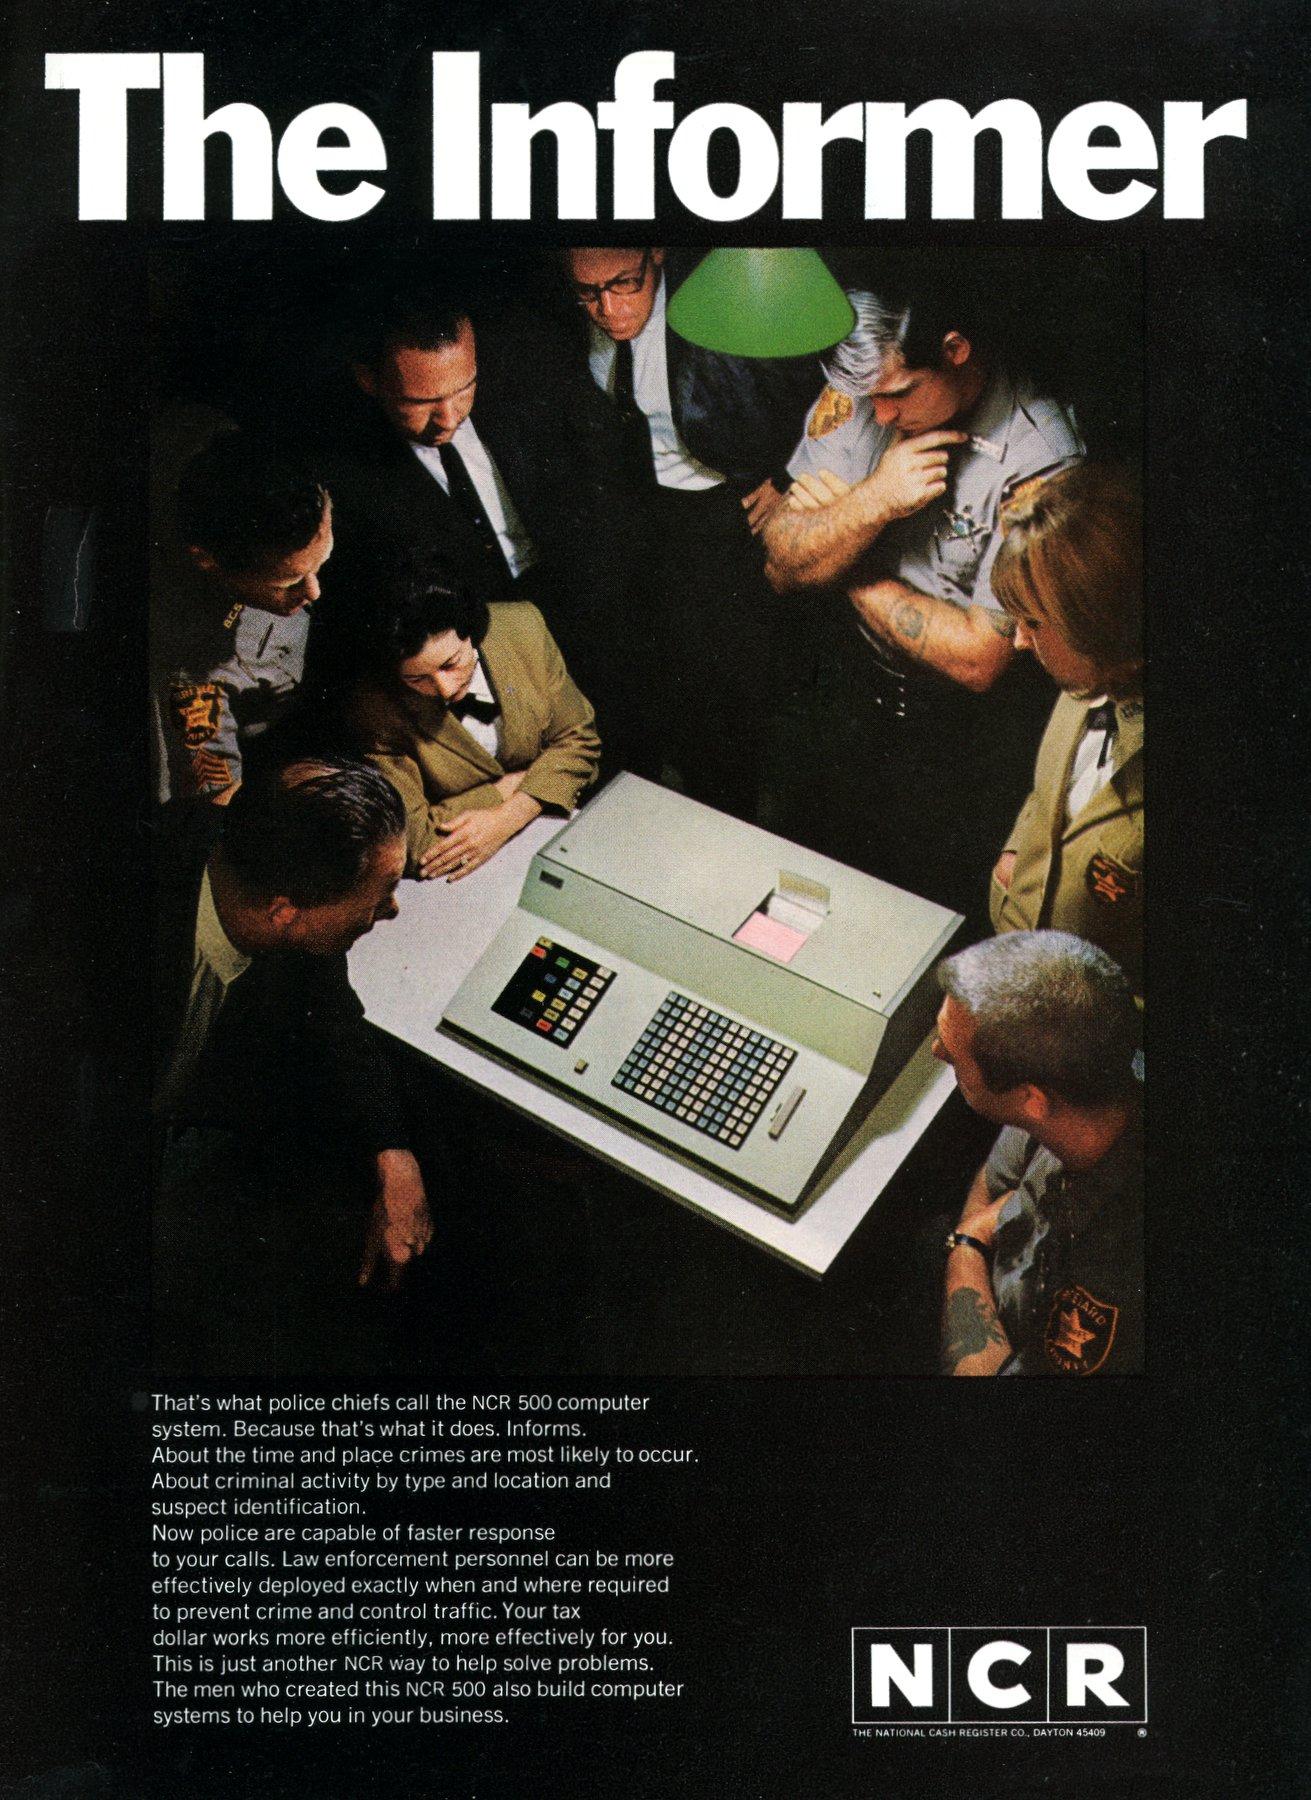 NCR Informer computer - Minority report-style (1967)